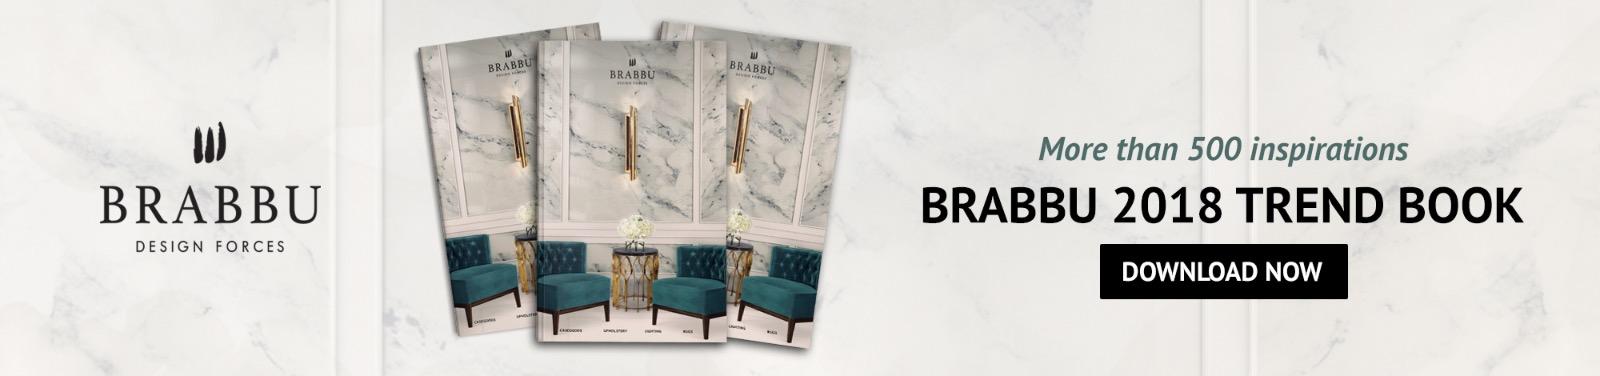 best fabrics Know the Best Fabrics from BRABBU Know the Best Fabrics from BRABBU 1